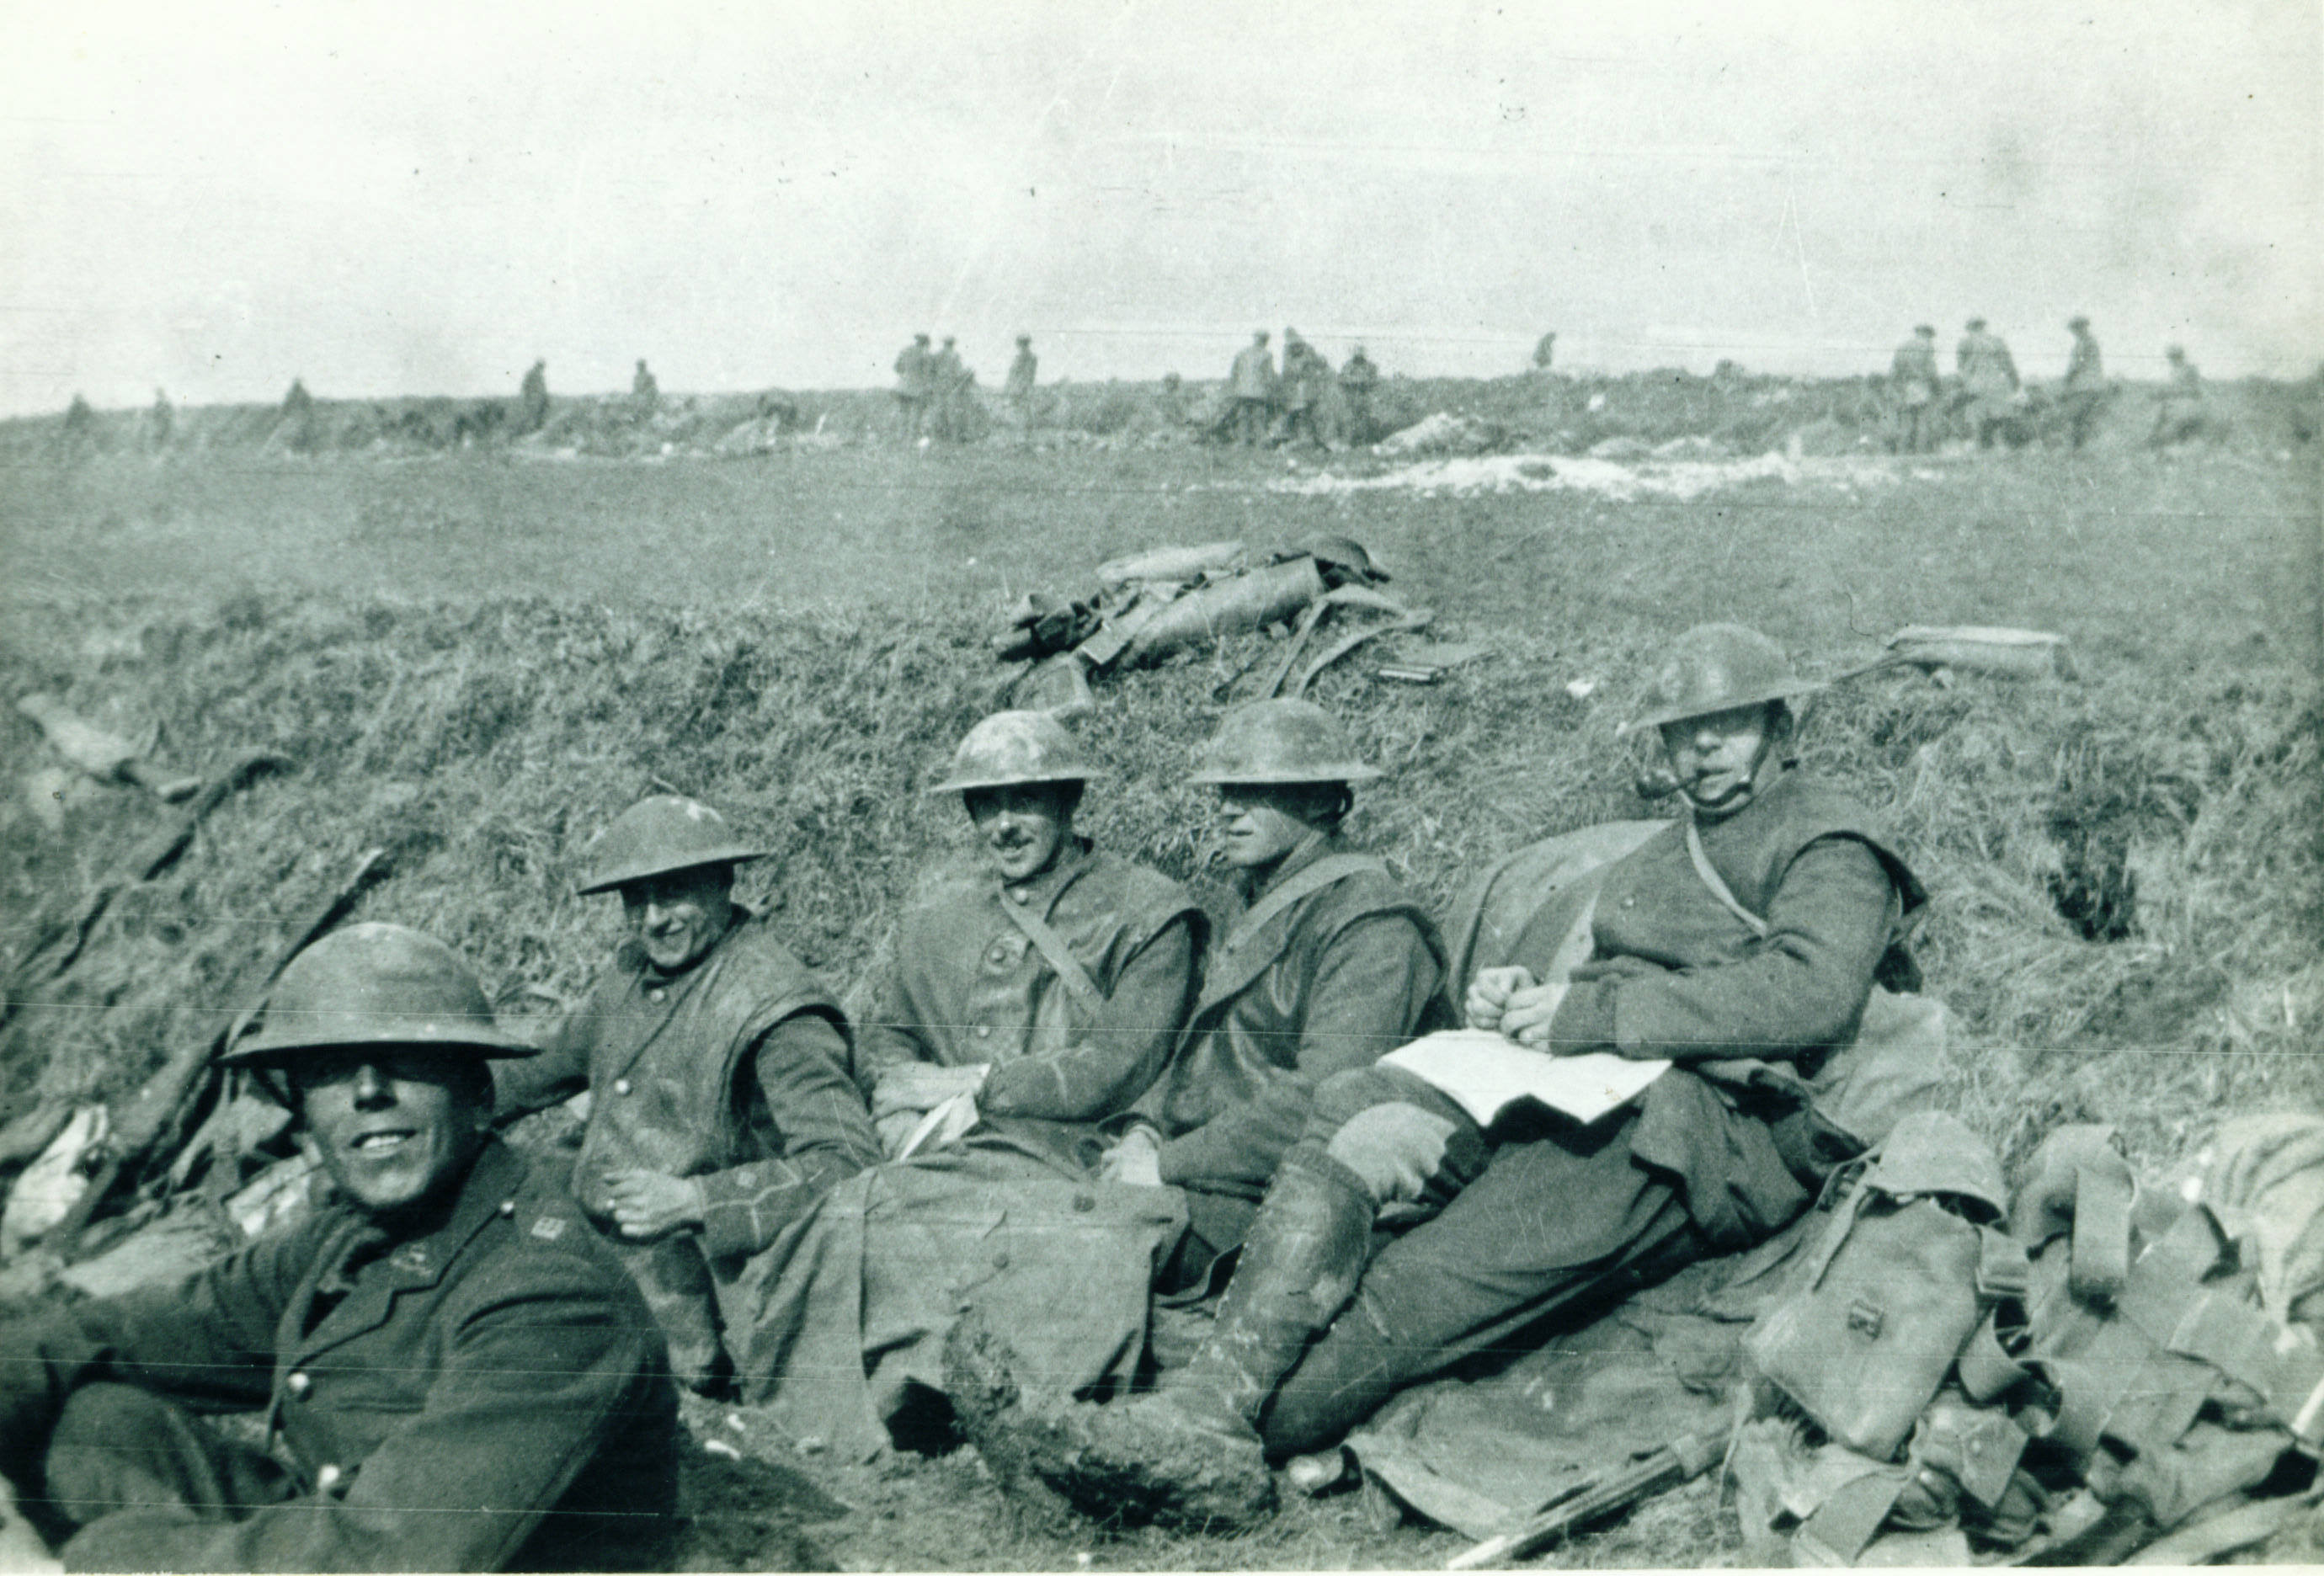 offensives of 1917 arras cambrai tour leger holidays battlefield tours. Black Bedroom Furniture Sets. Home Design Ideas